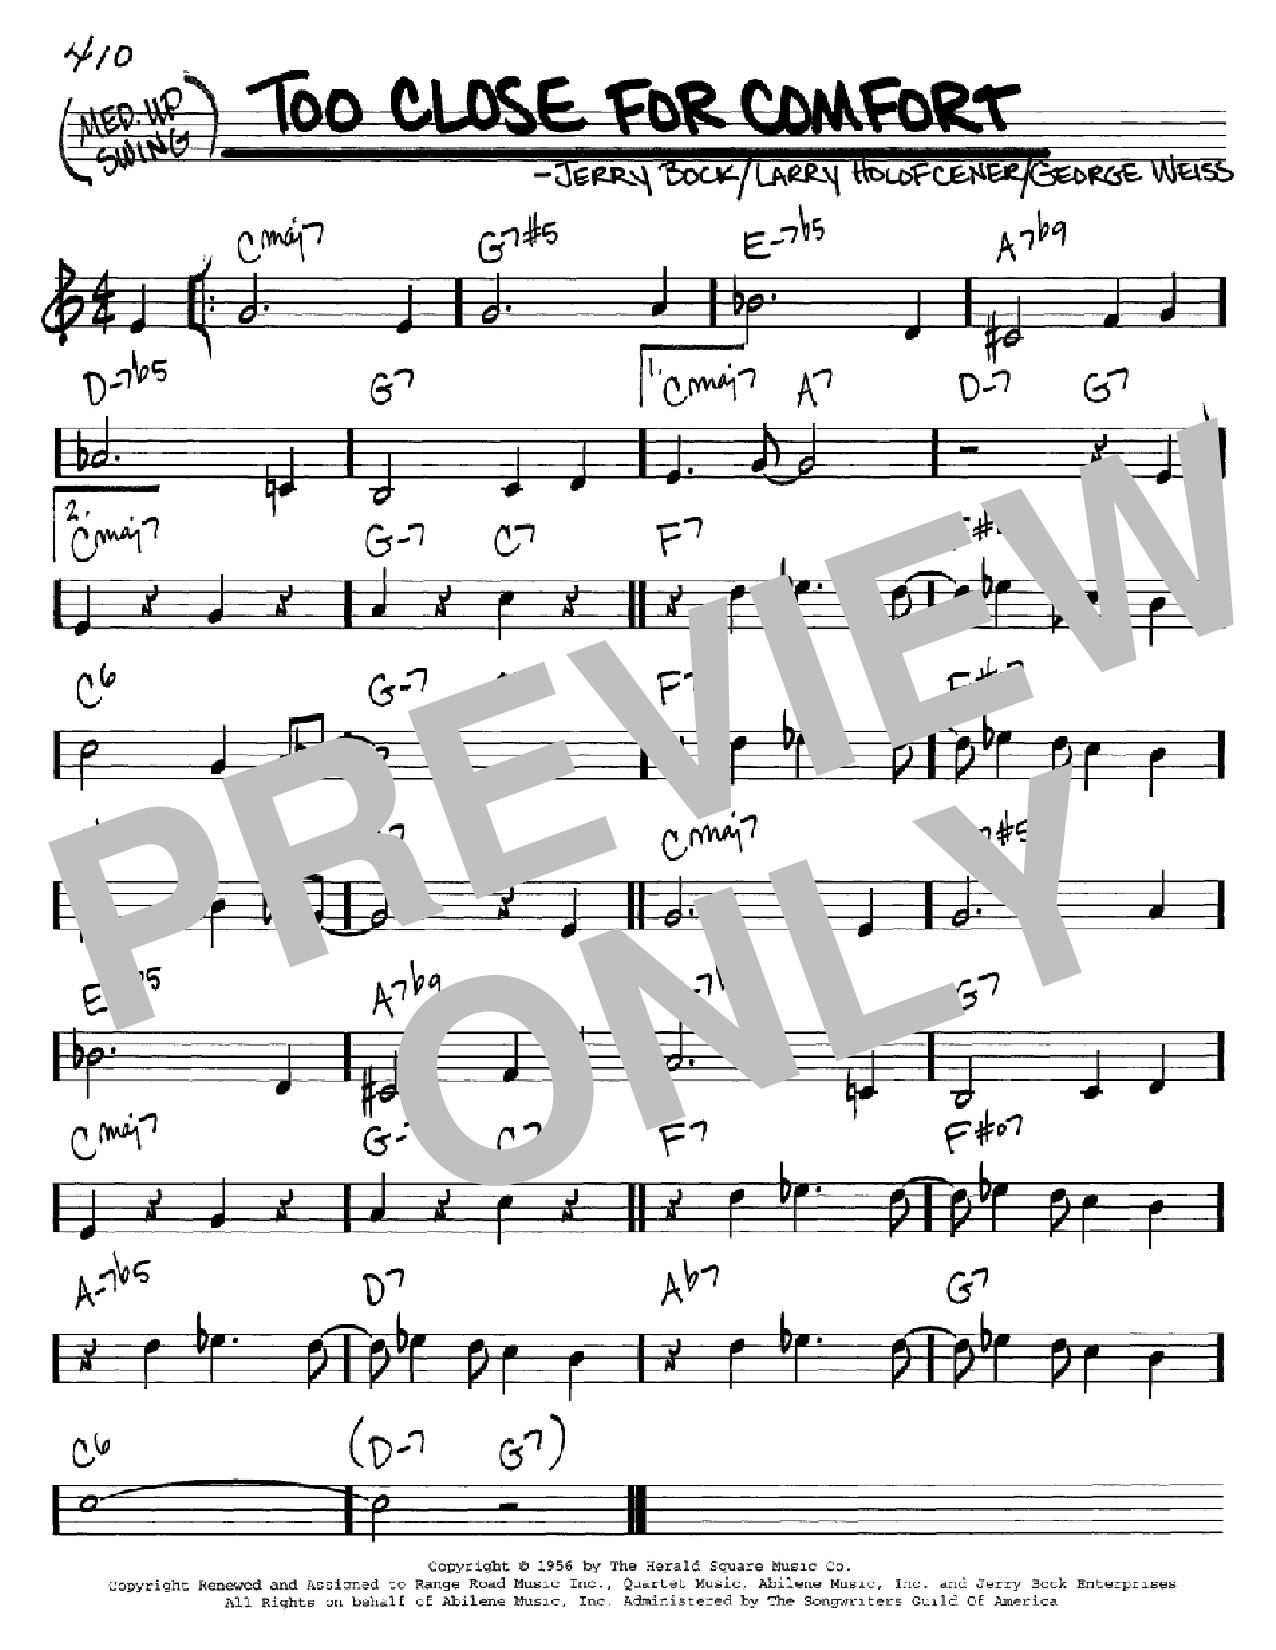 Partition autre Too Close For Comfort de Jerry Bock - Real Book, Melodie et Accords, Inst. En Do